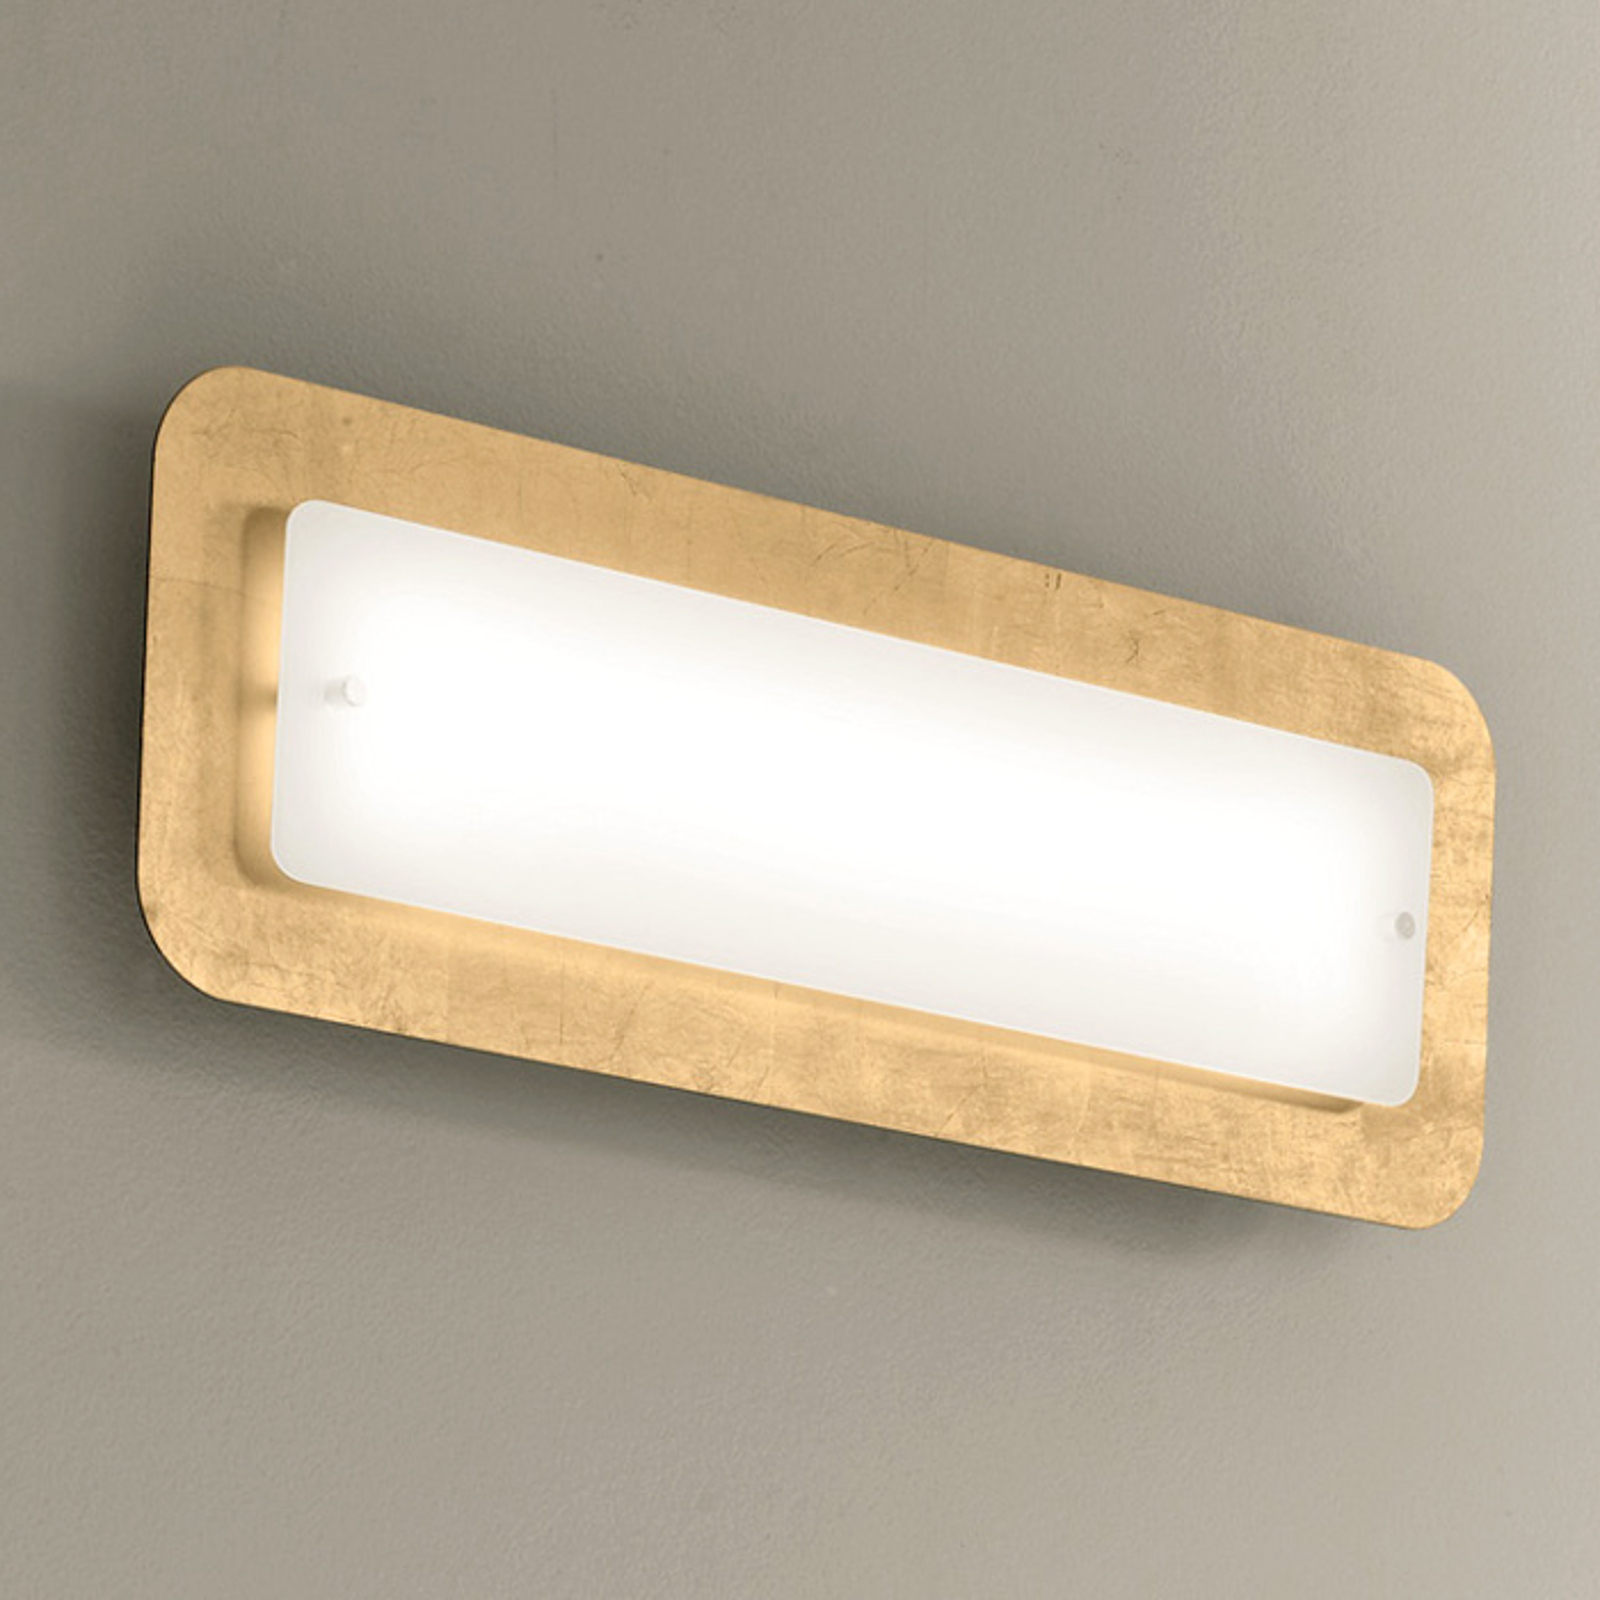 Vegglampe PopUp med bladgull ramme